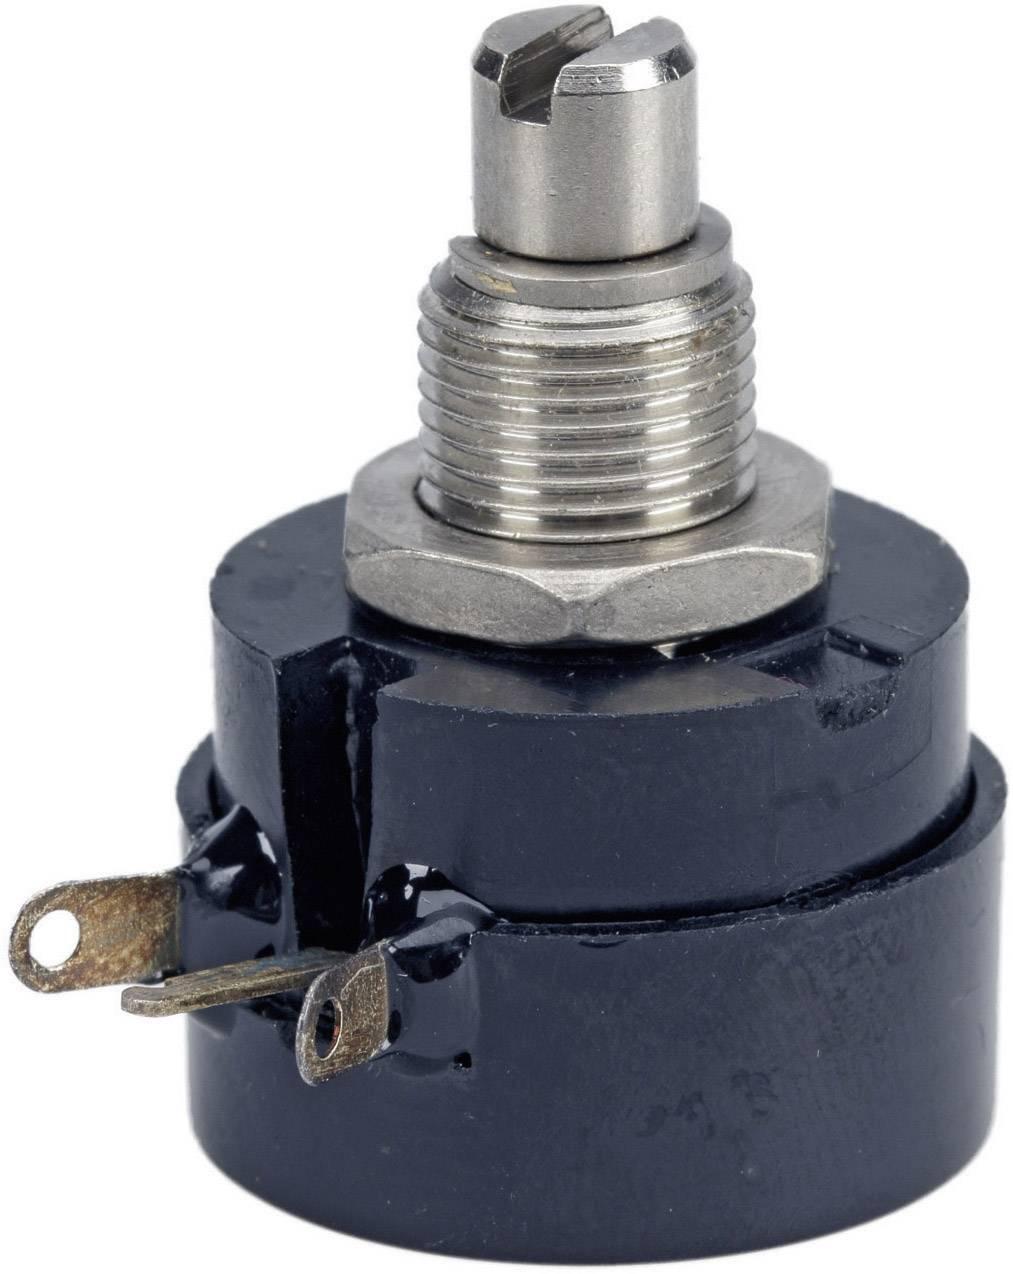 Drôtový potenciometer TT Electro, 3101106925, 250 Ω, 0.5 W, ± 10%